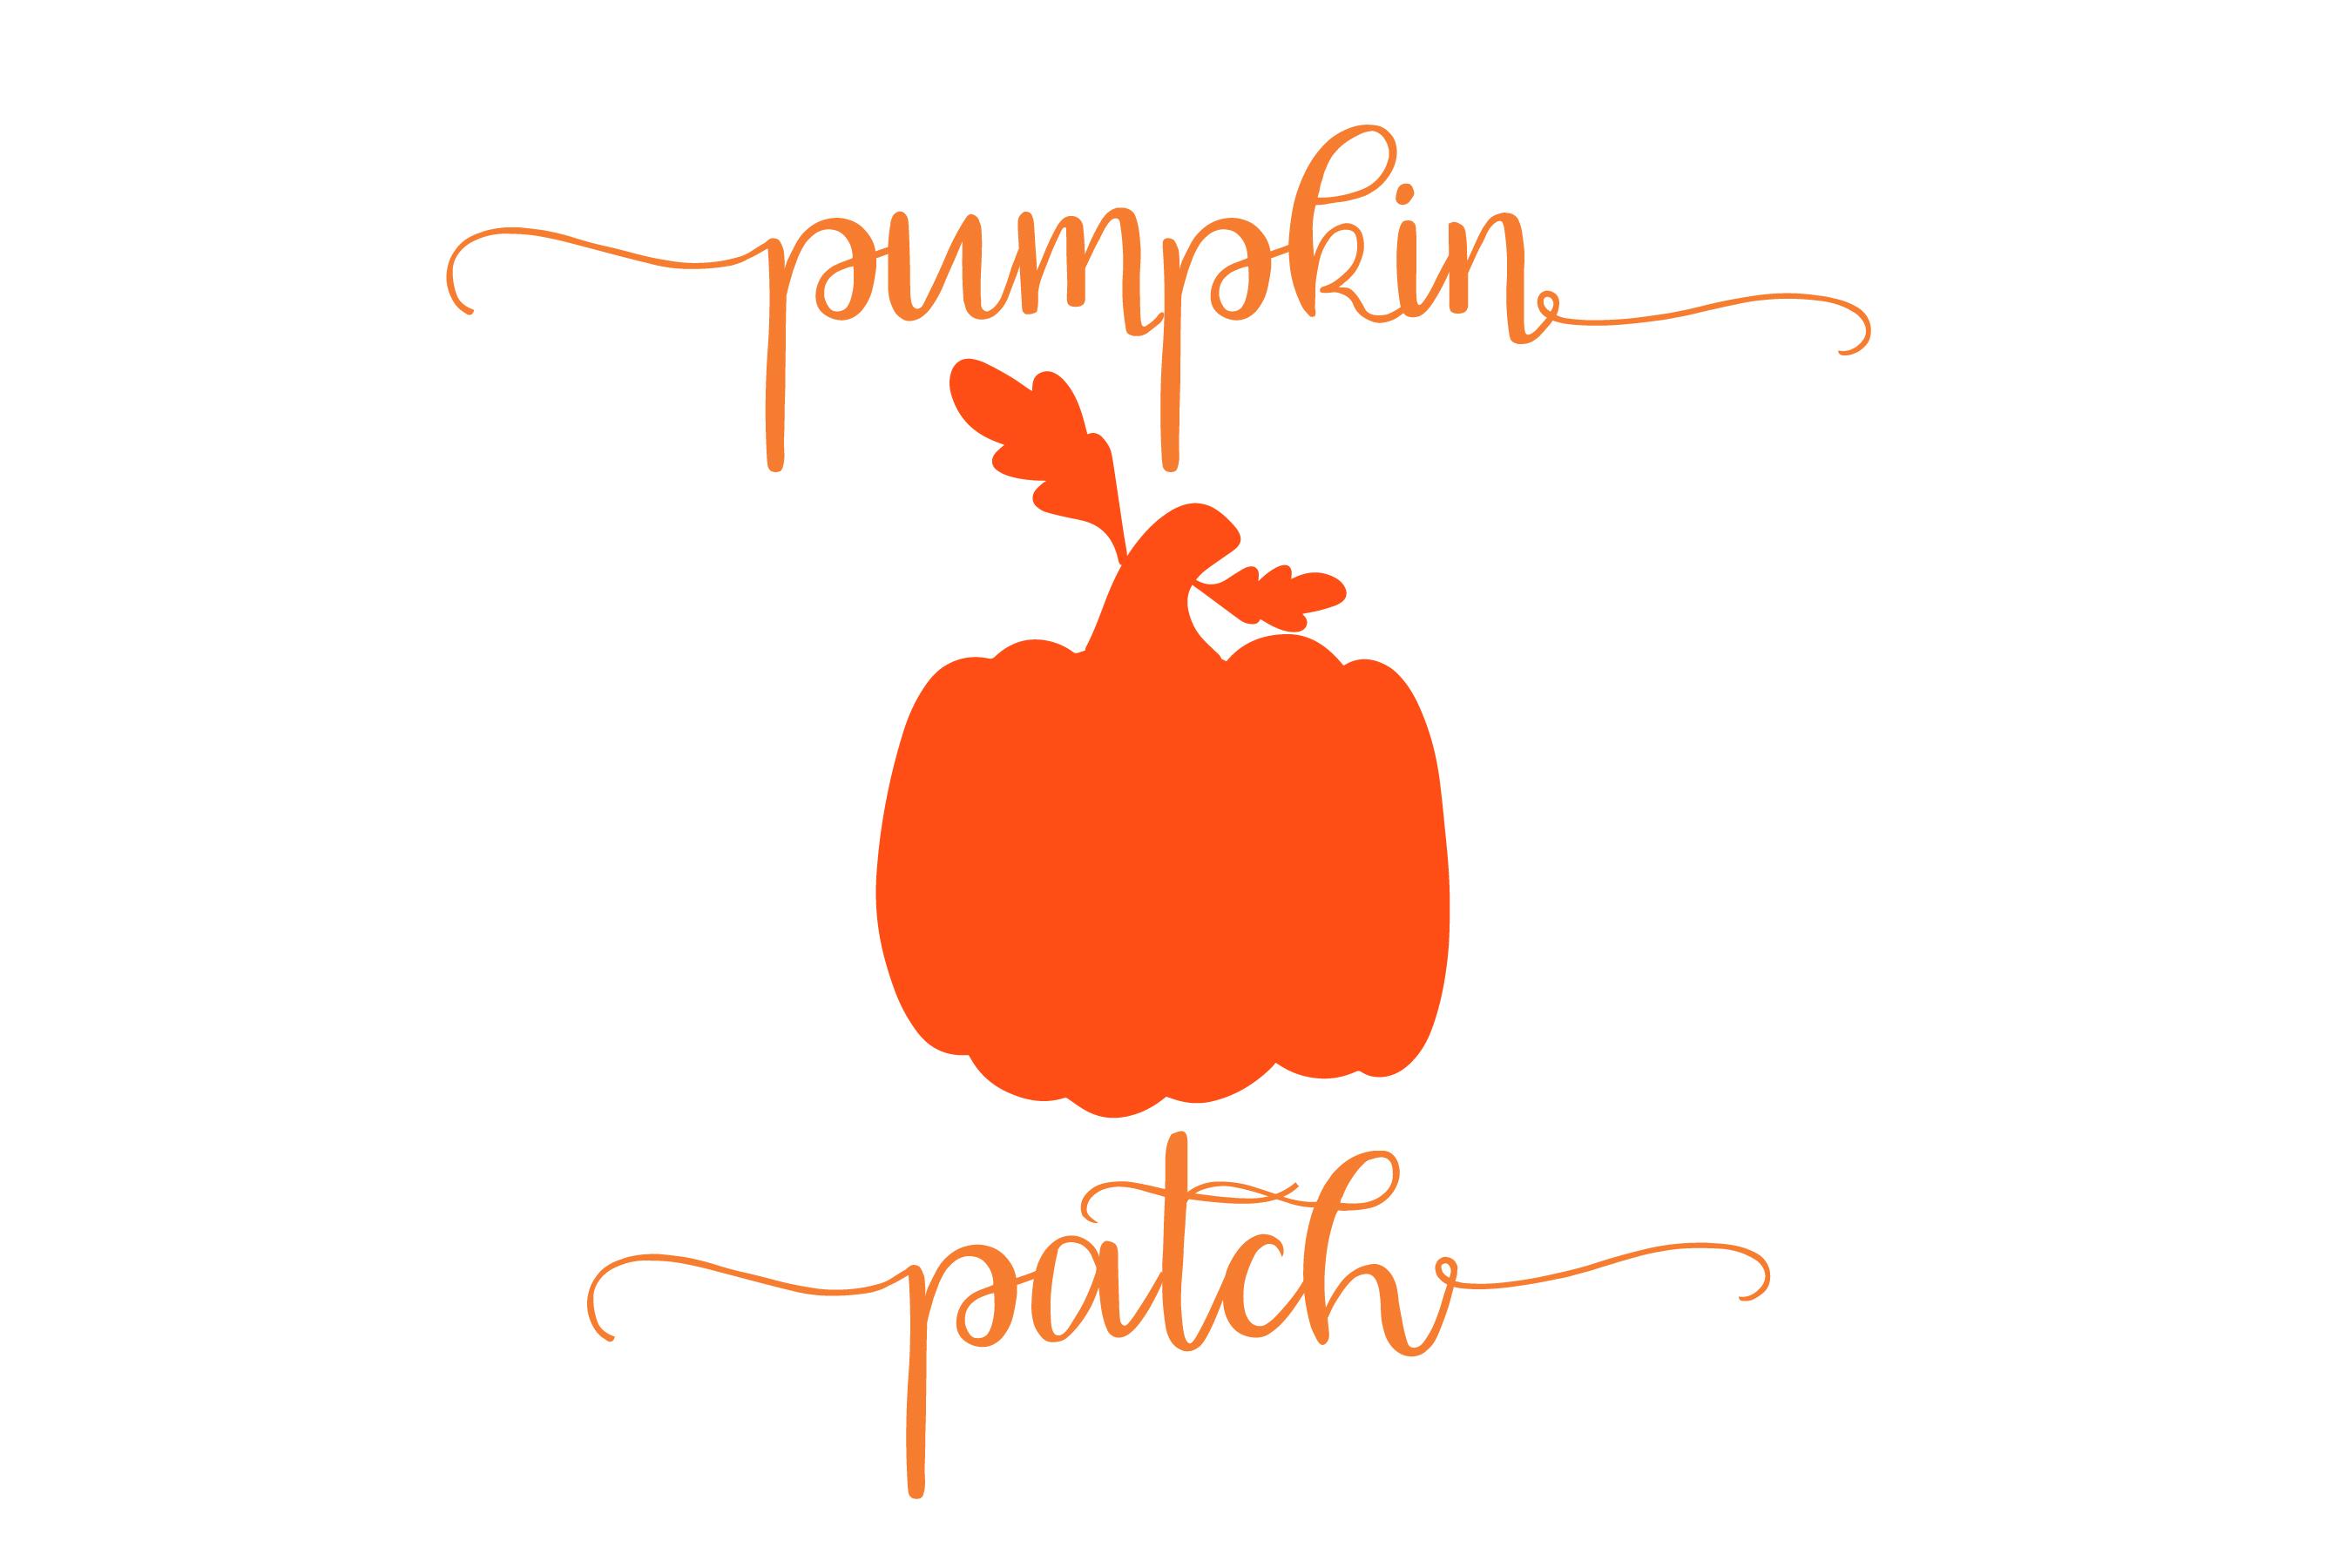 Pumpkin patch - Pumpkin Monogram 5 Designs SVG cut File example image 2